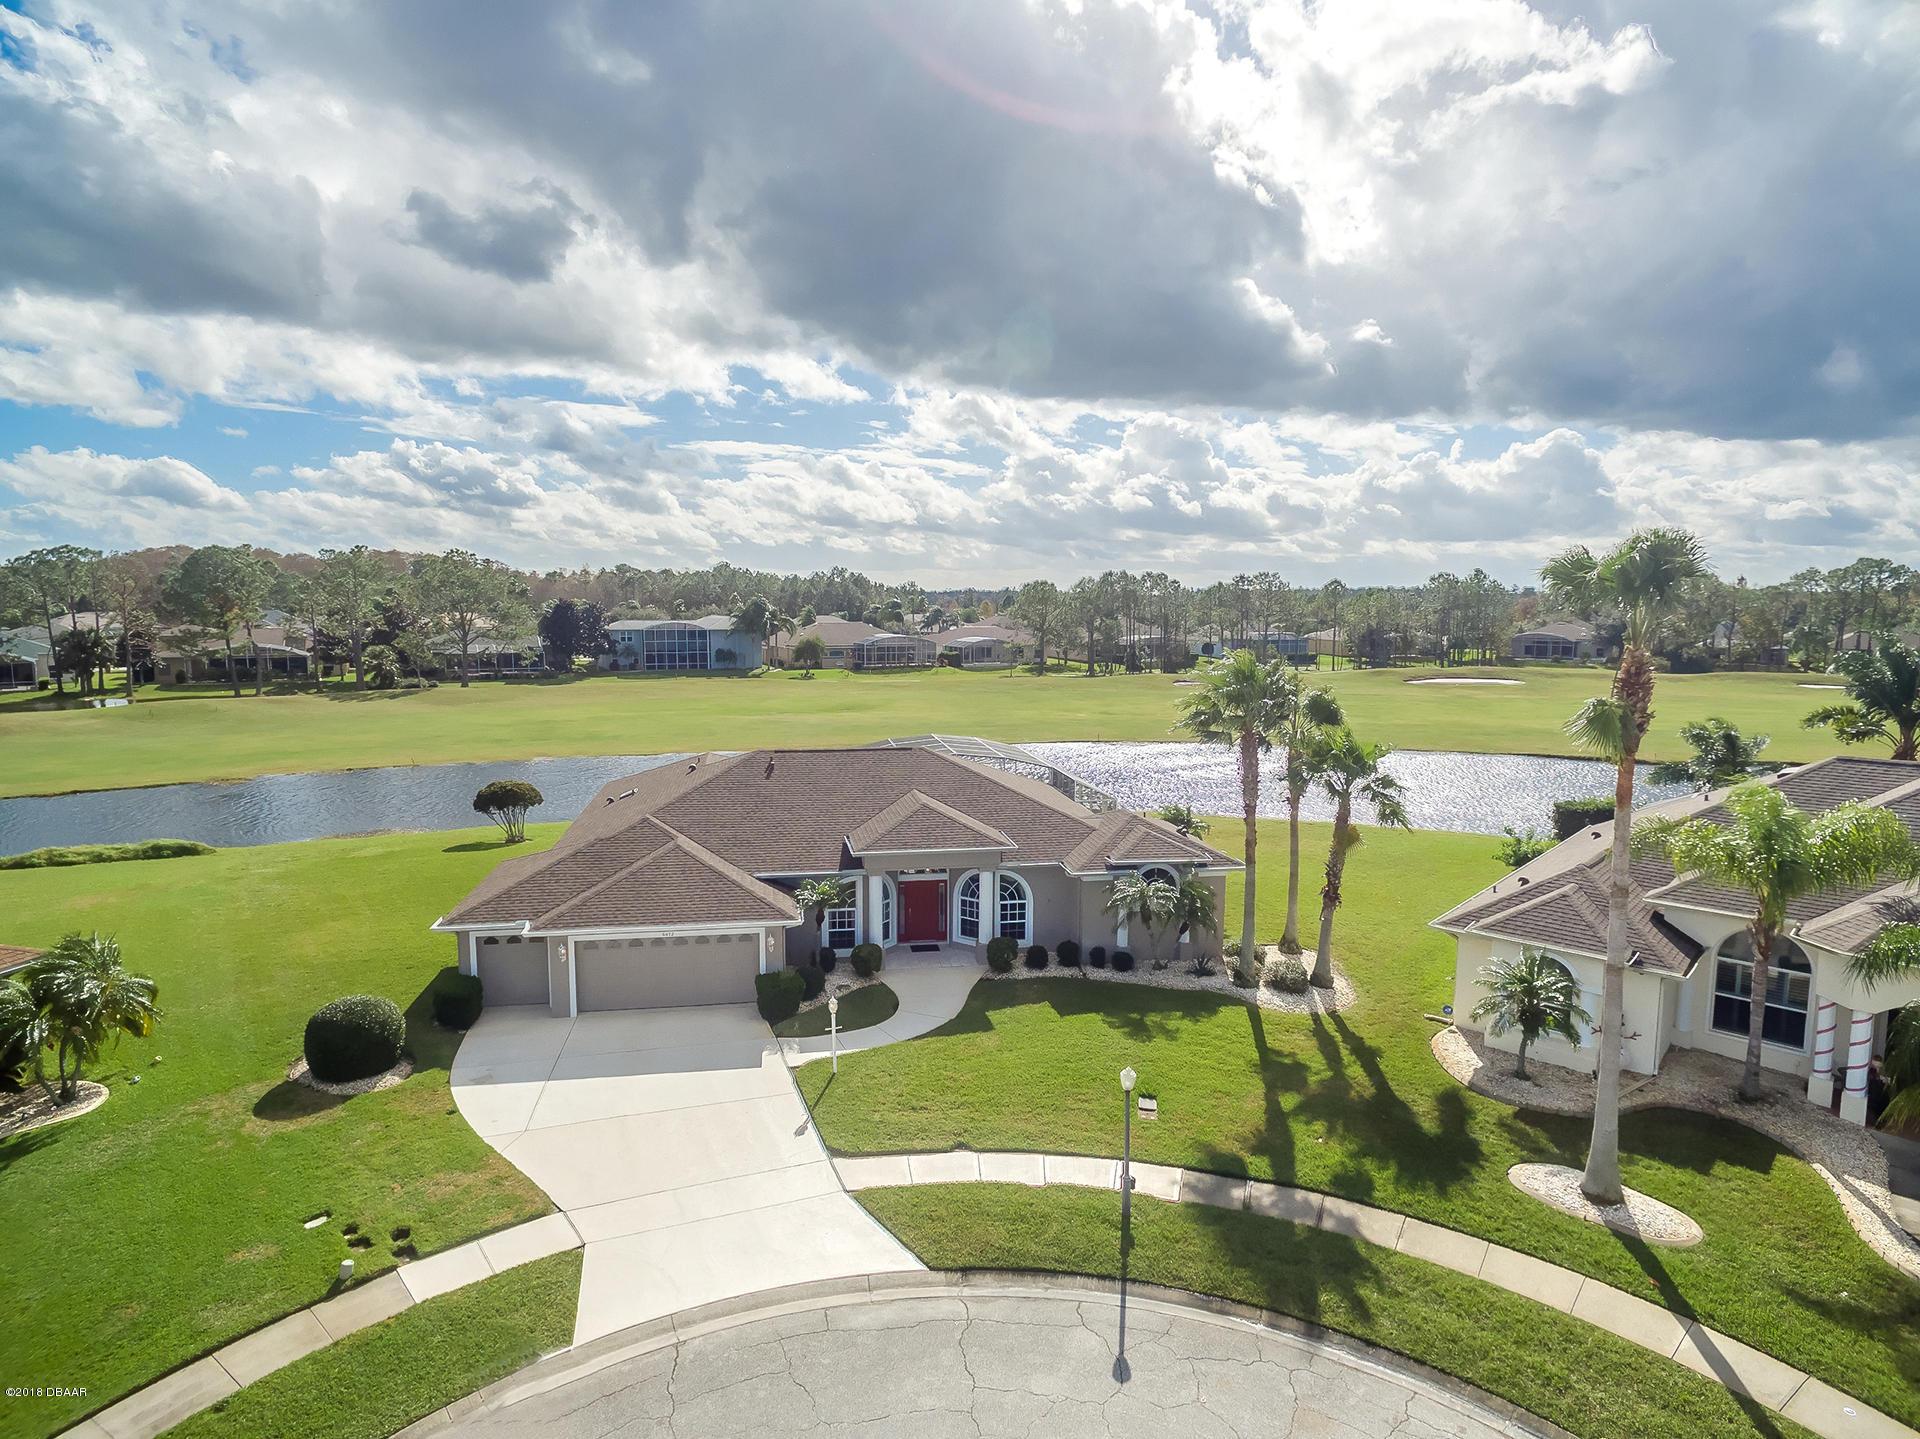 Photo of 6472 Renaissance Drive, Port Orange, FL 32128